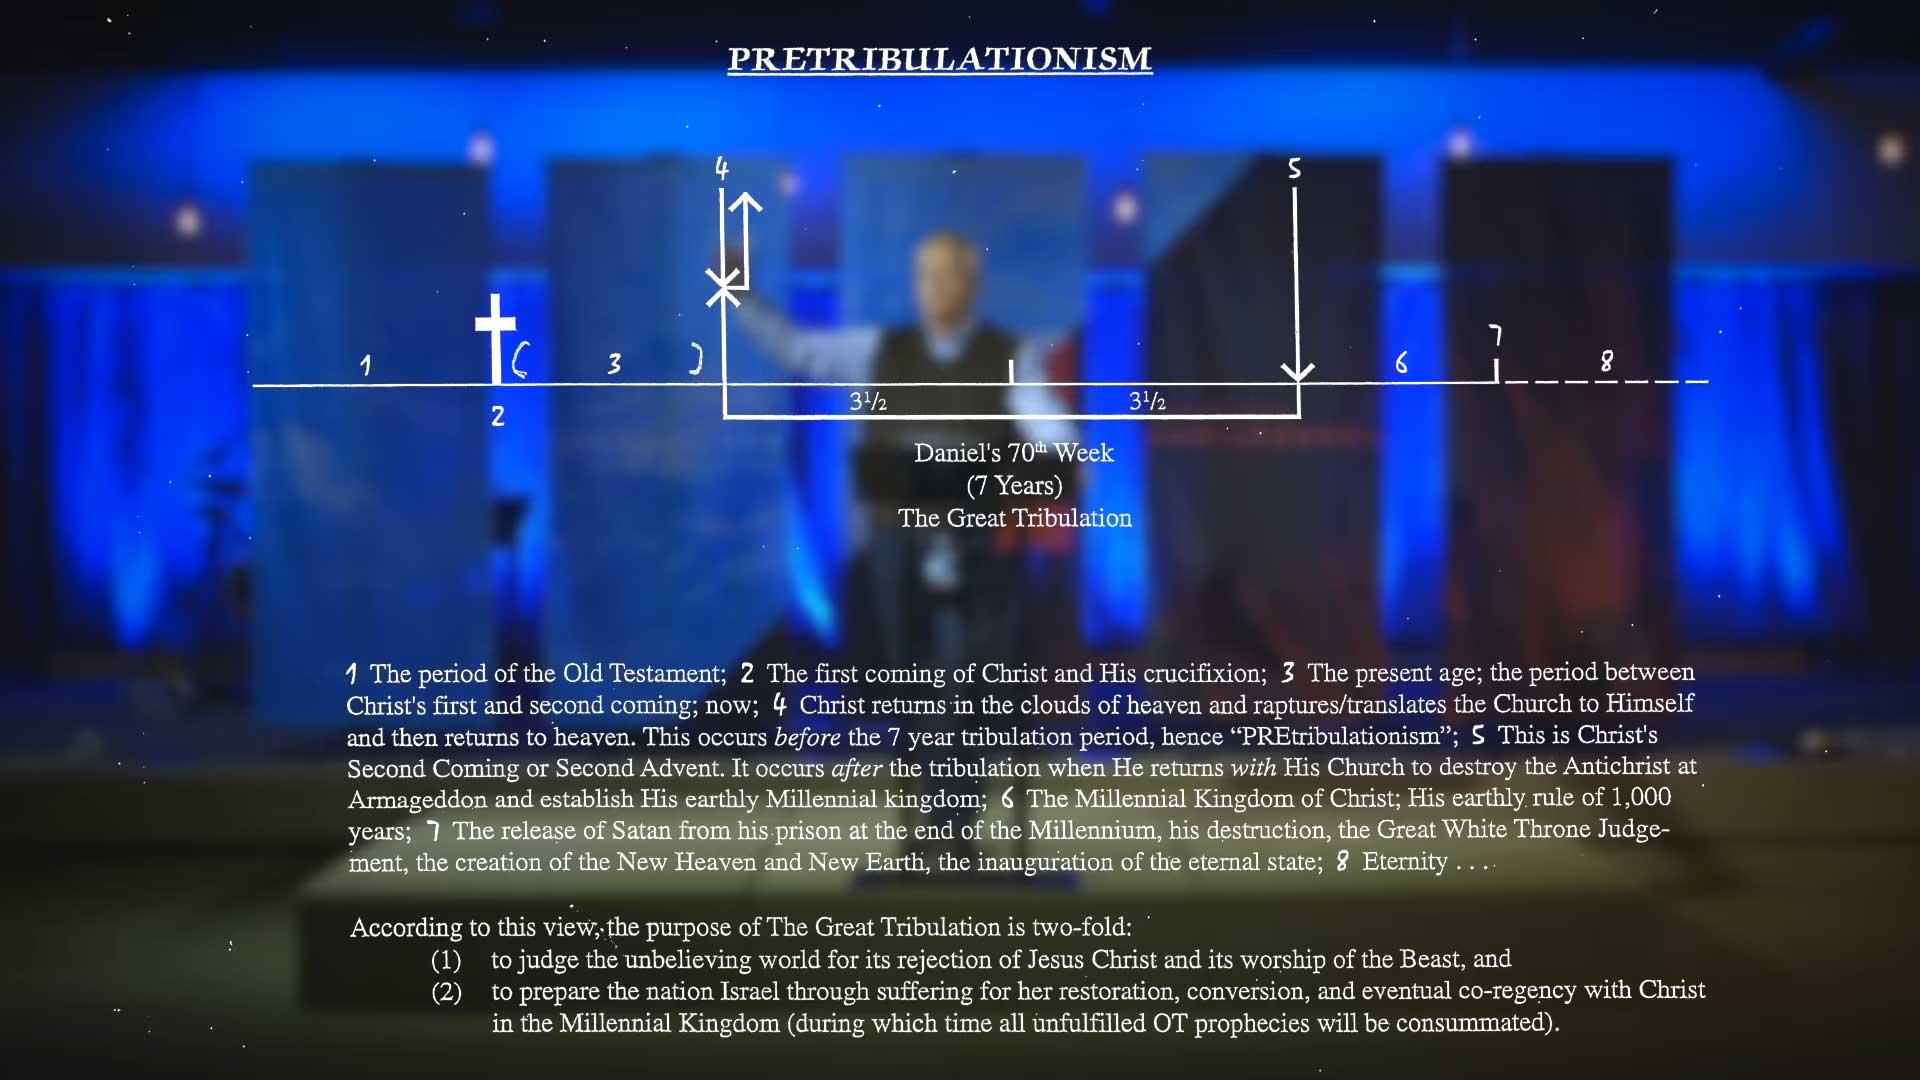 pre-tribulational premillennialism